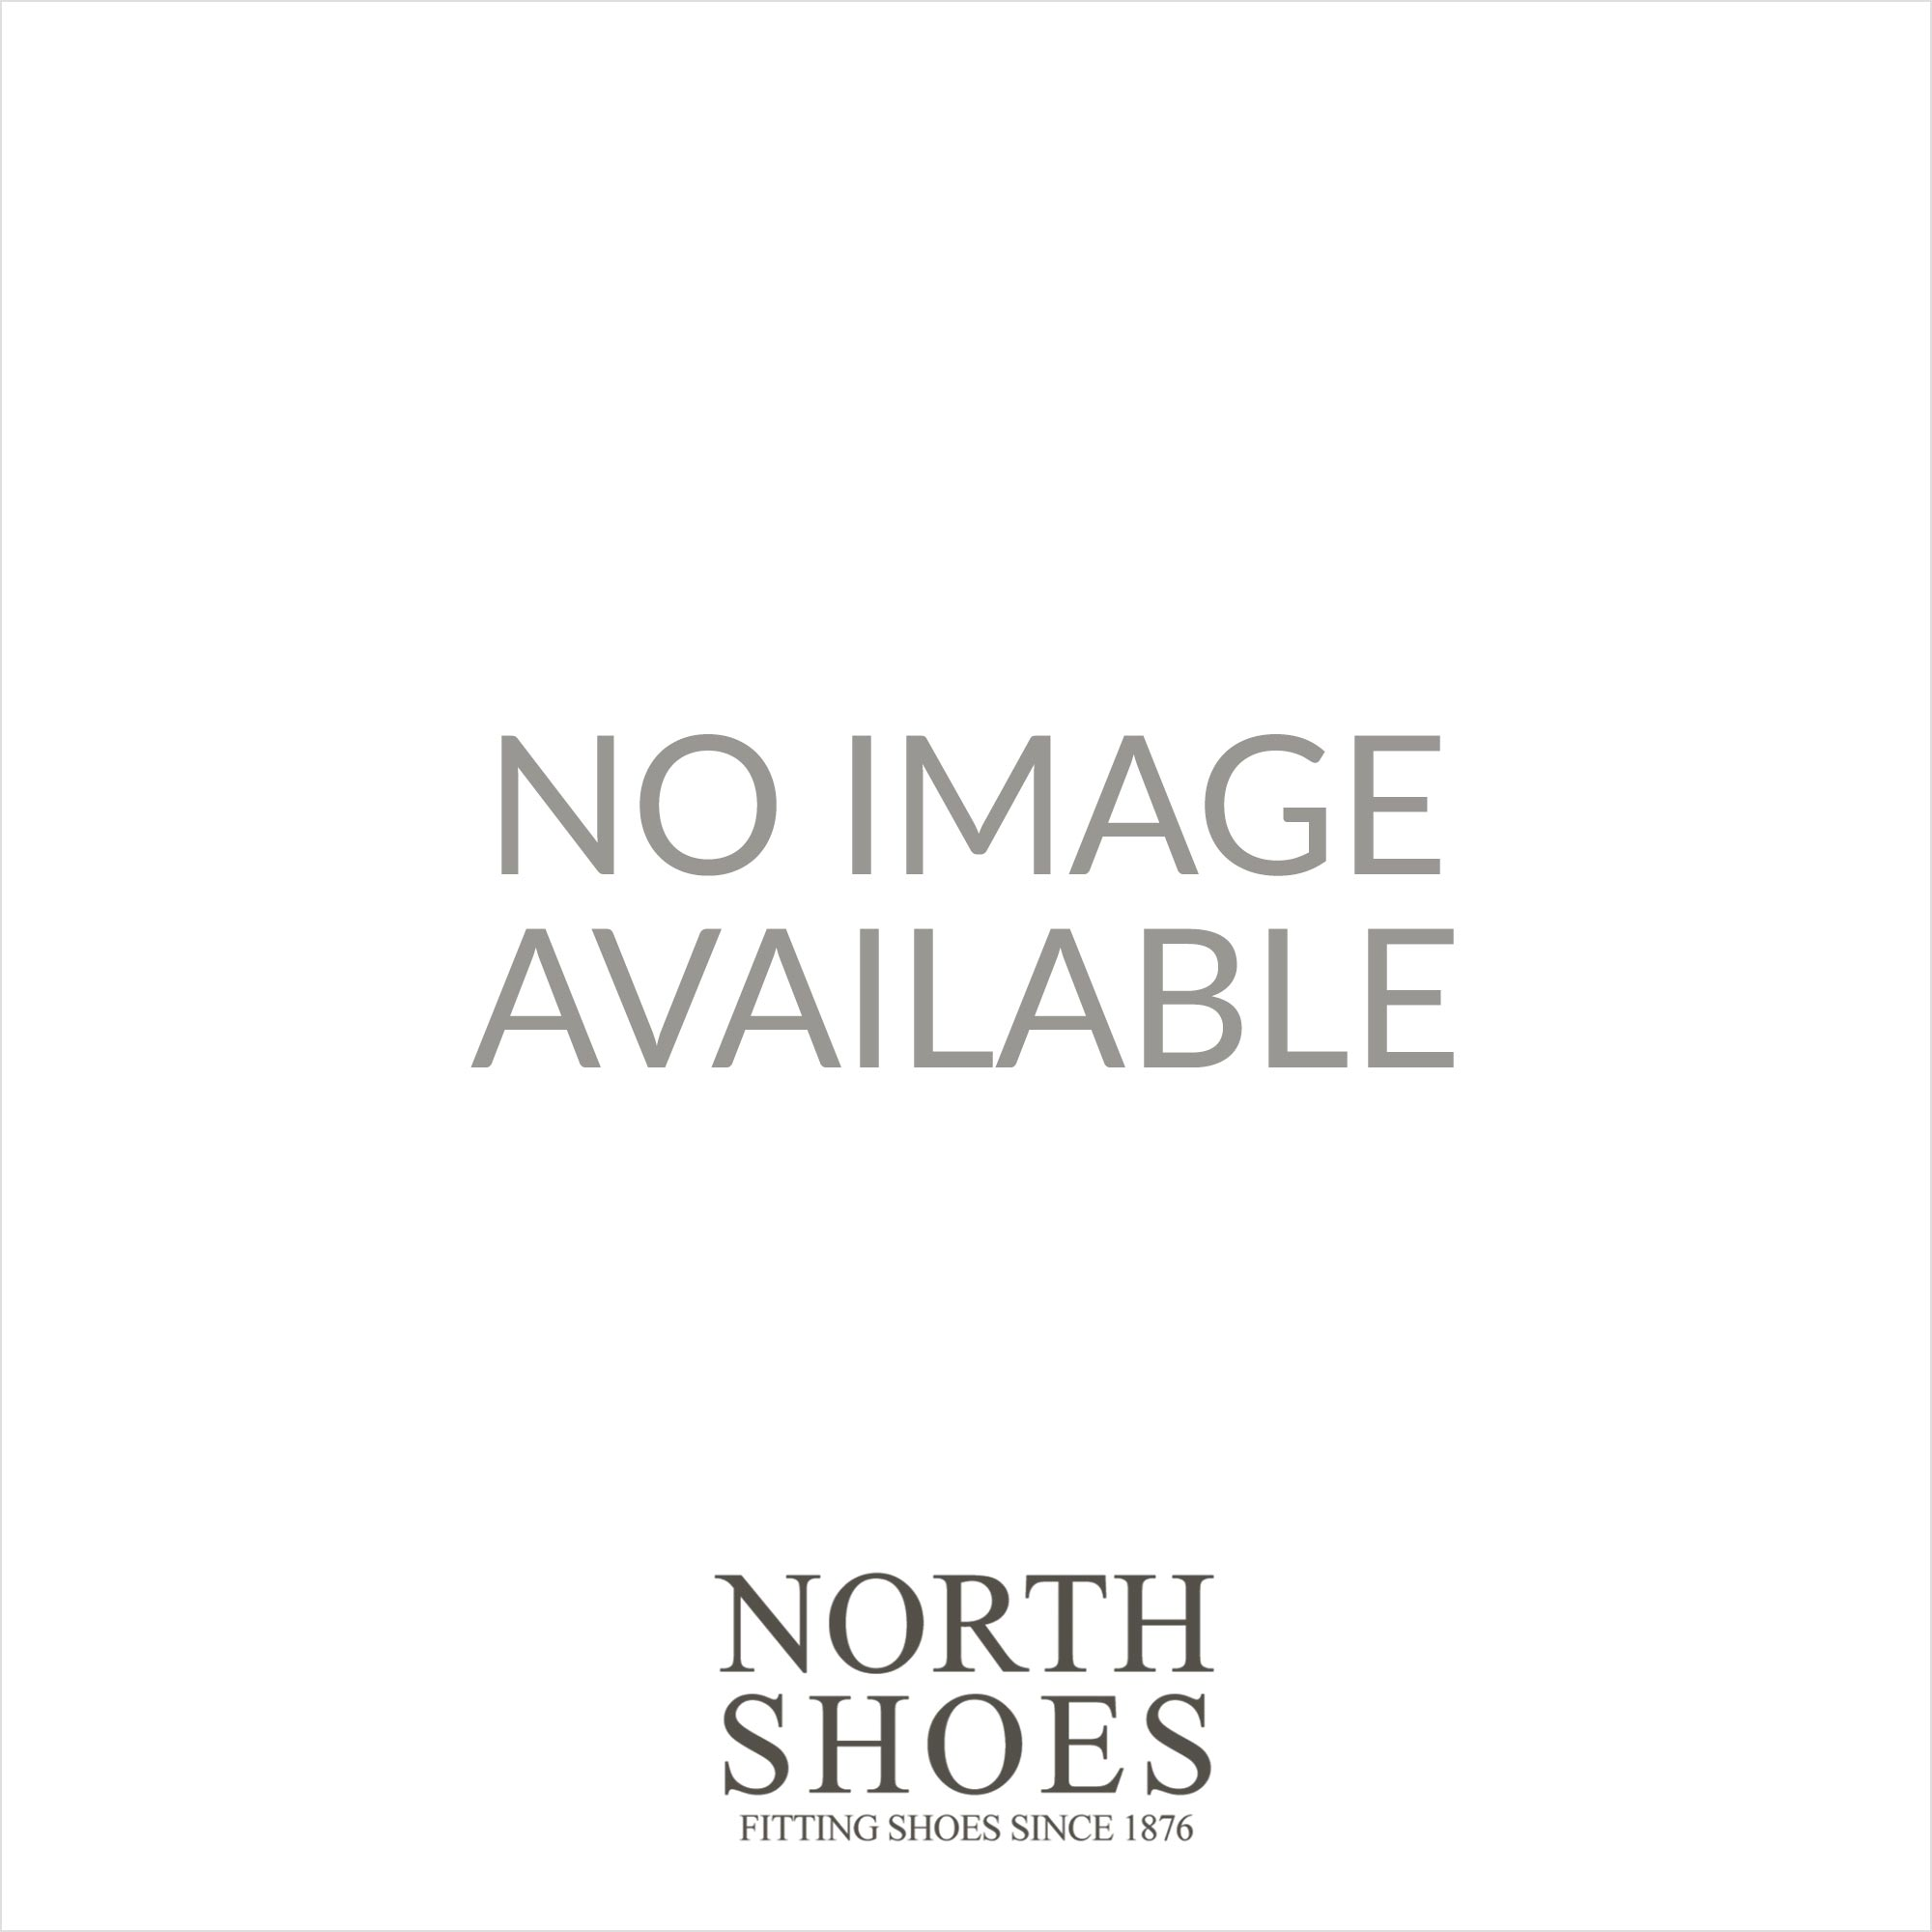 4a8724afc5d Rieker 69739-45 Smoke Grey Leather Womens Adjustable Strap Heeled Sandal